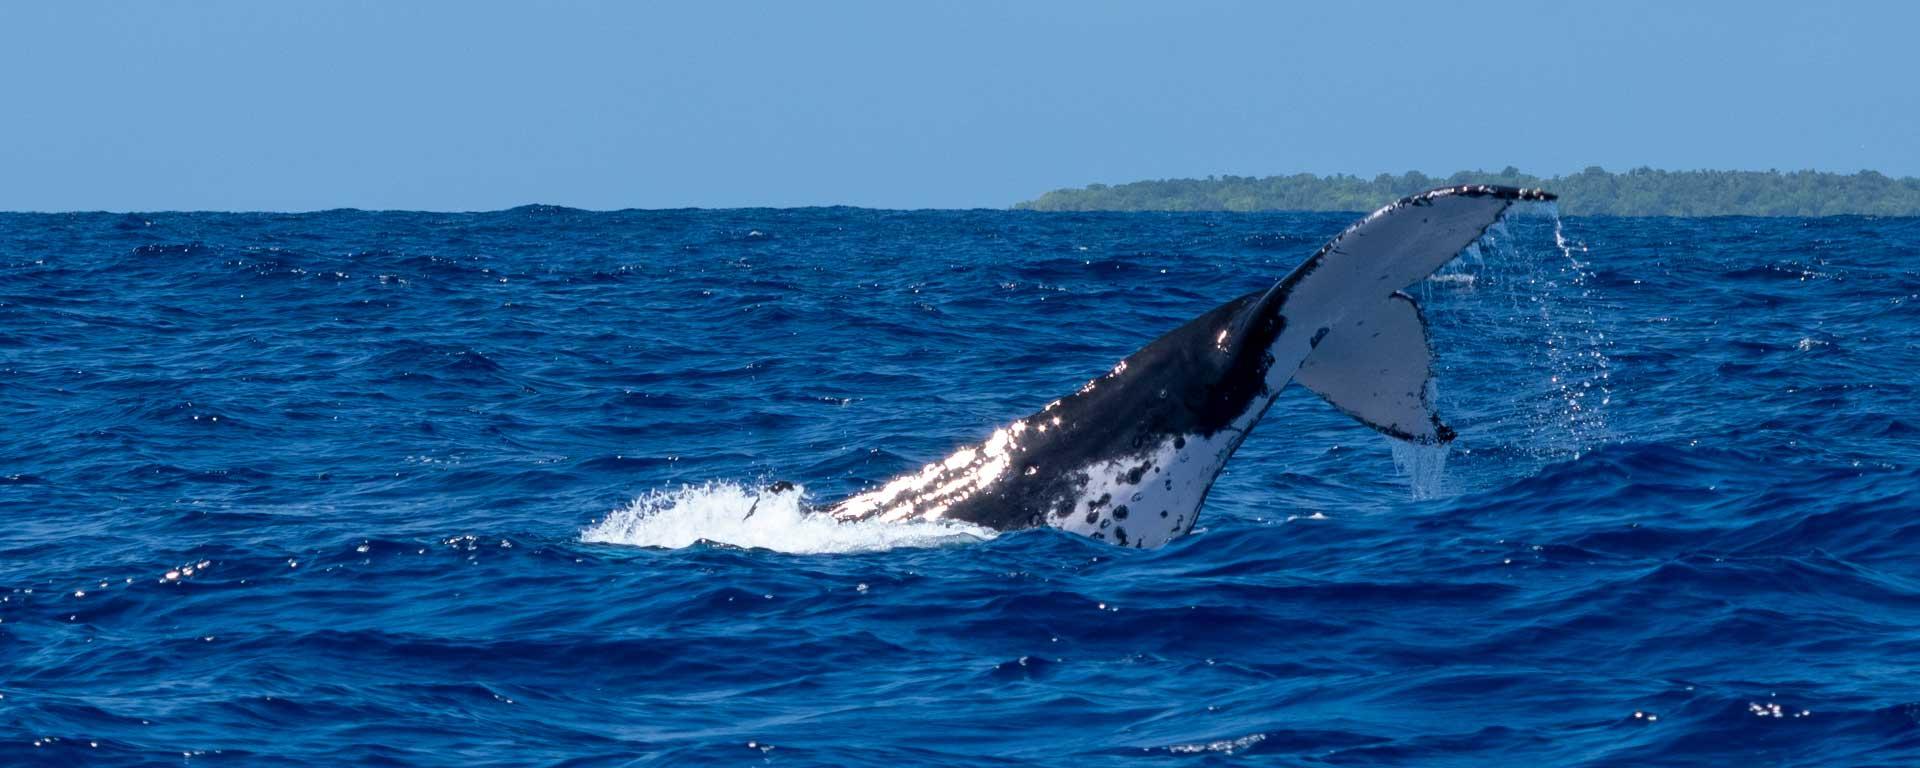 Abenteuer - Wale